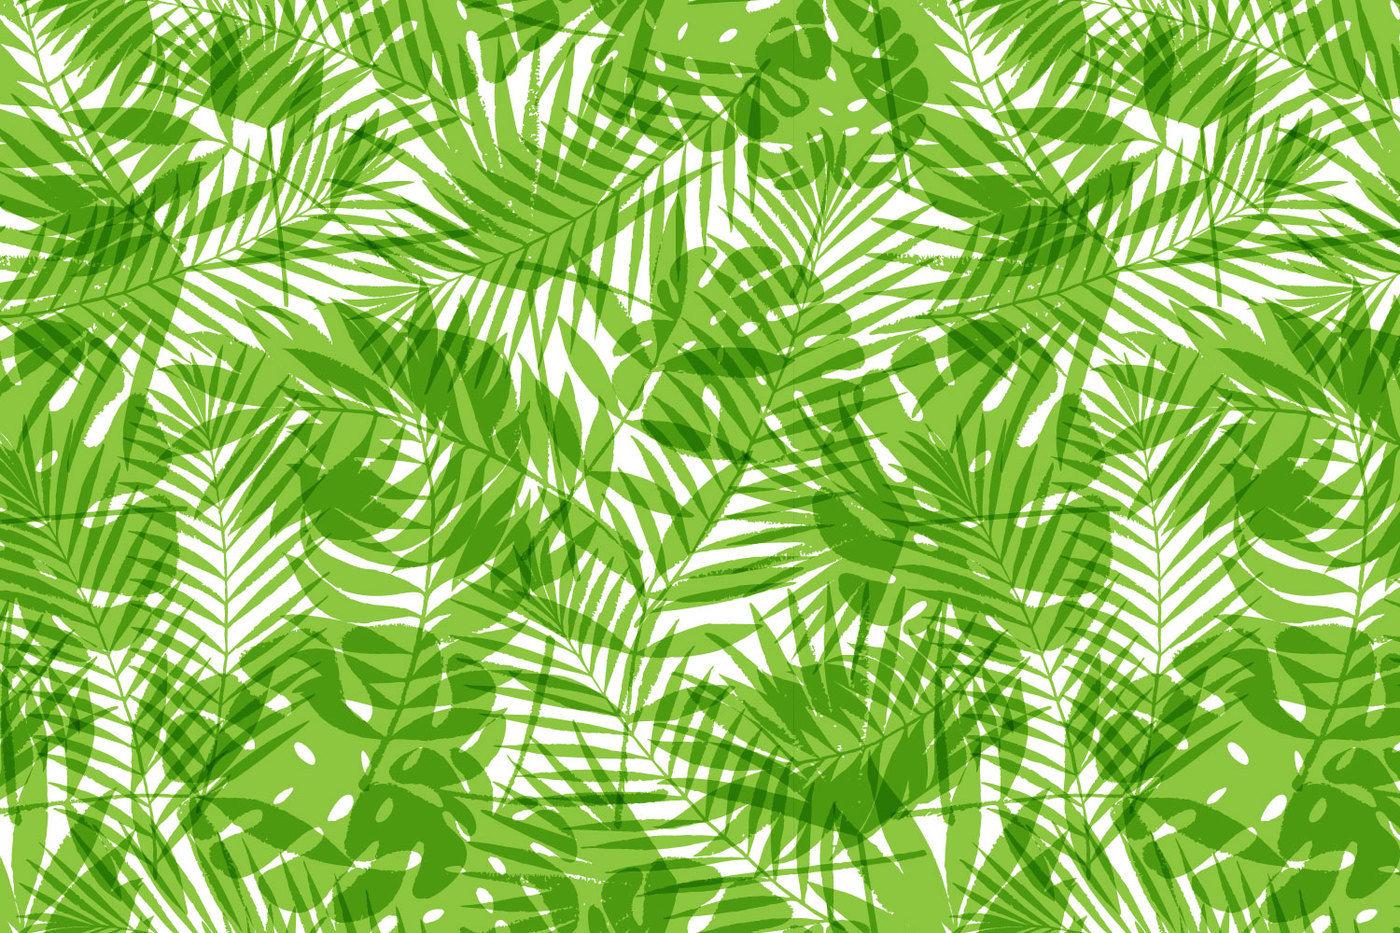 Summer Tropical Palm Tree Leaves Seamless Pattern By Nata Kuprova